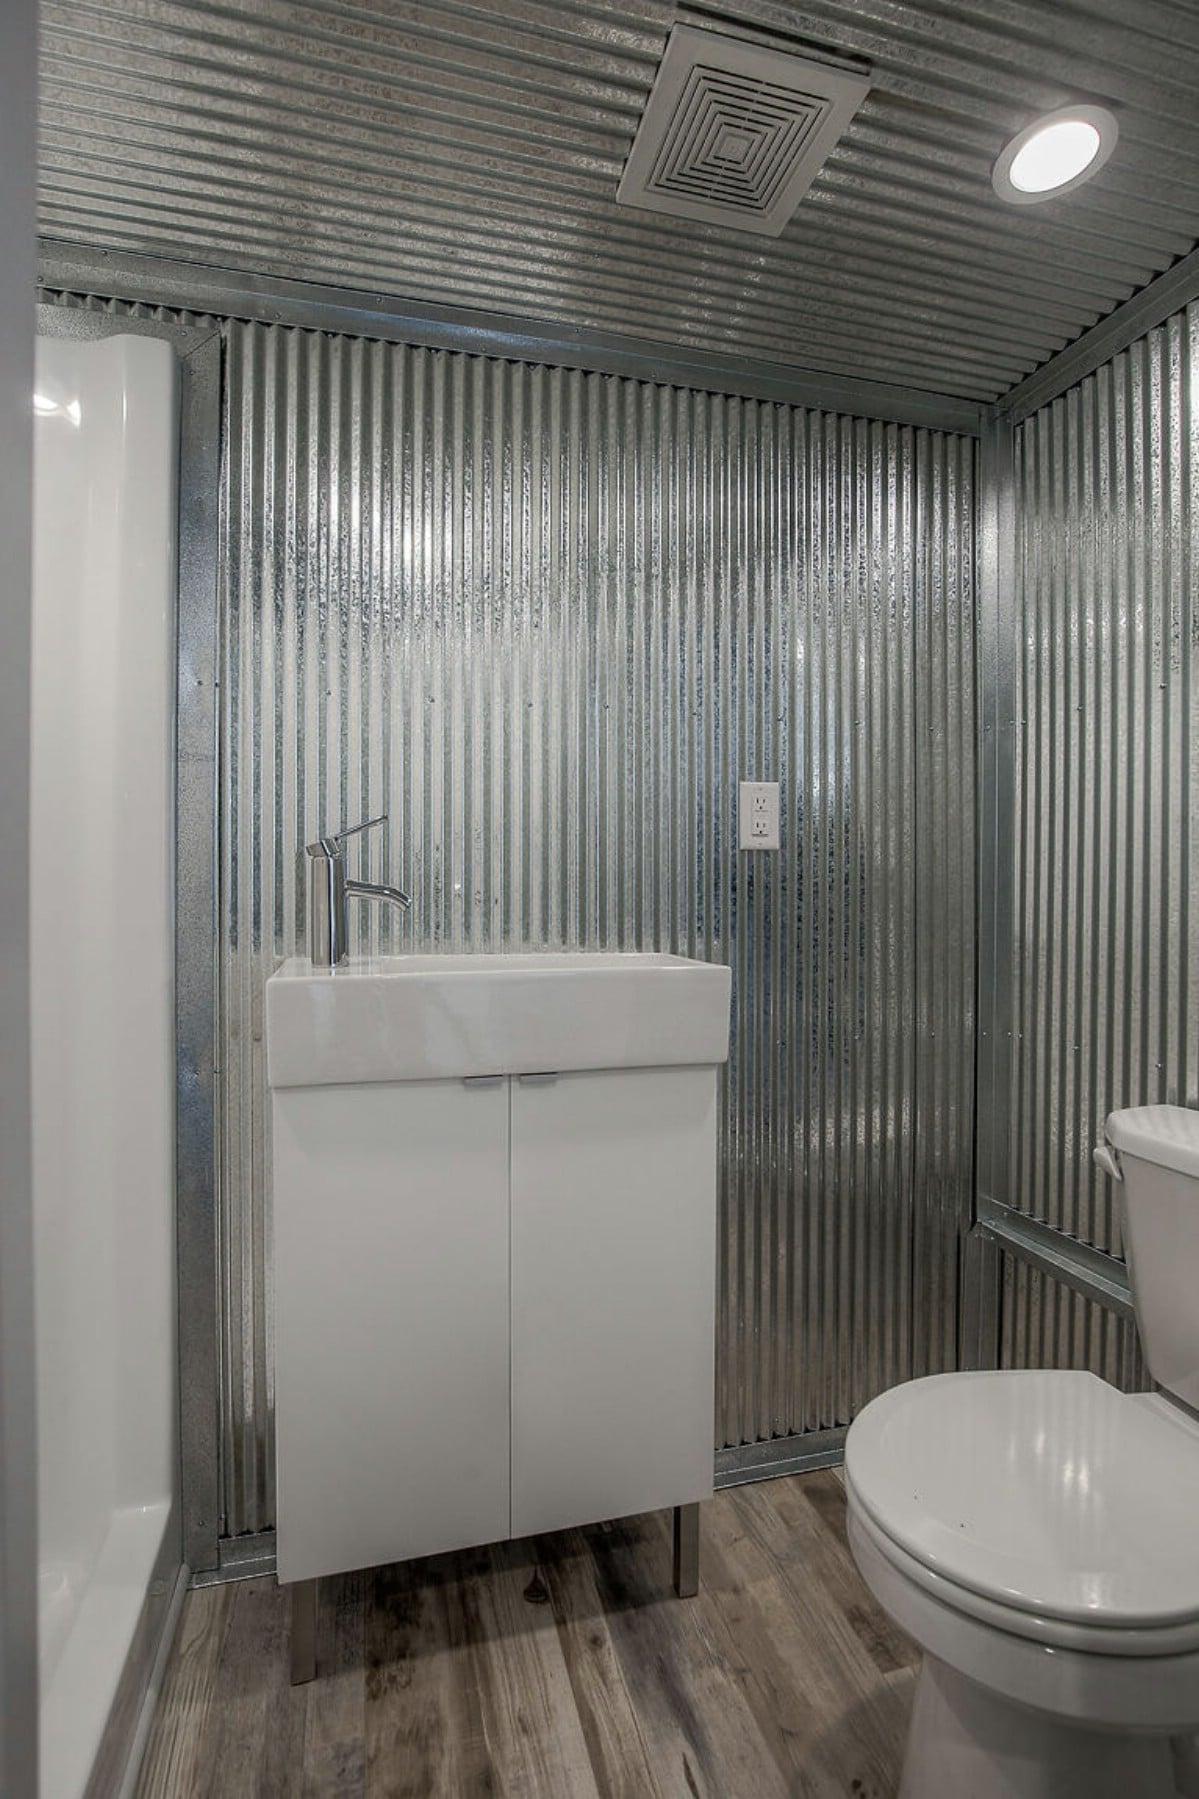 Corrugated metal wall with wood floor in bathroom